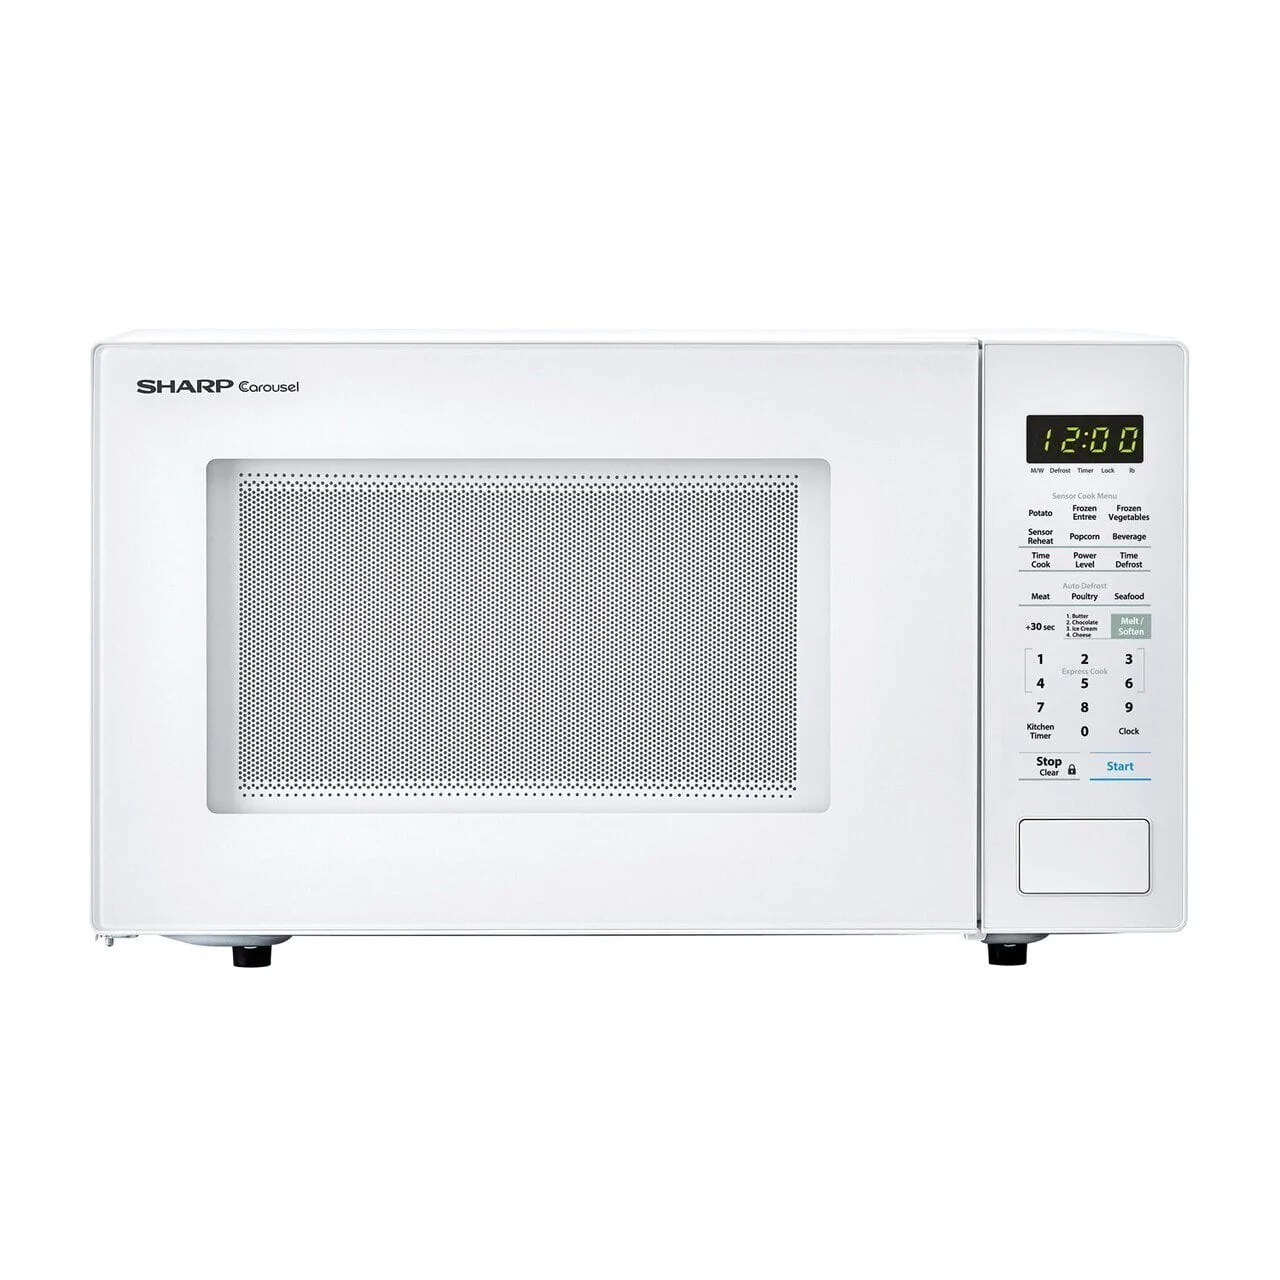 sharp smc1441cw 1 4 cu ft 1000w sharp white countertop microwave oven